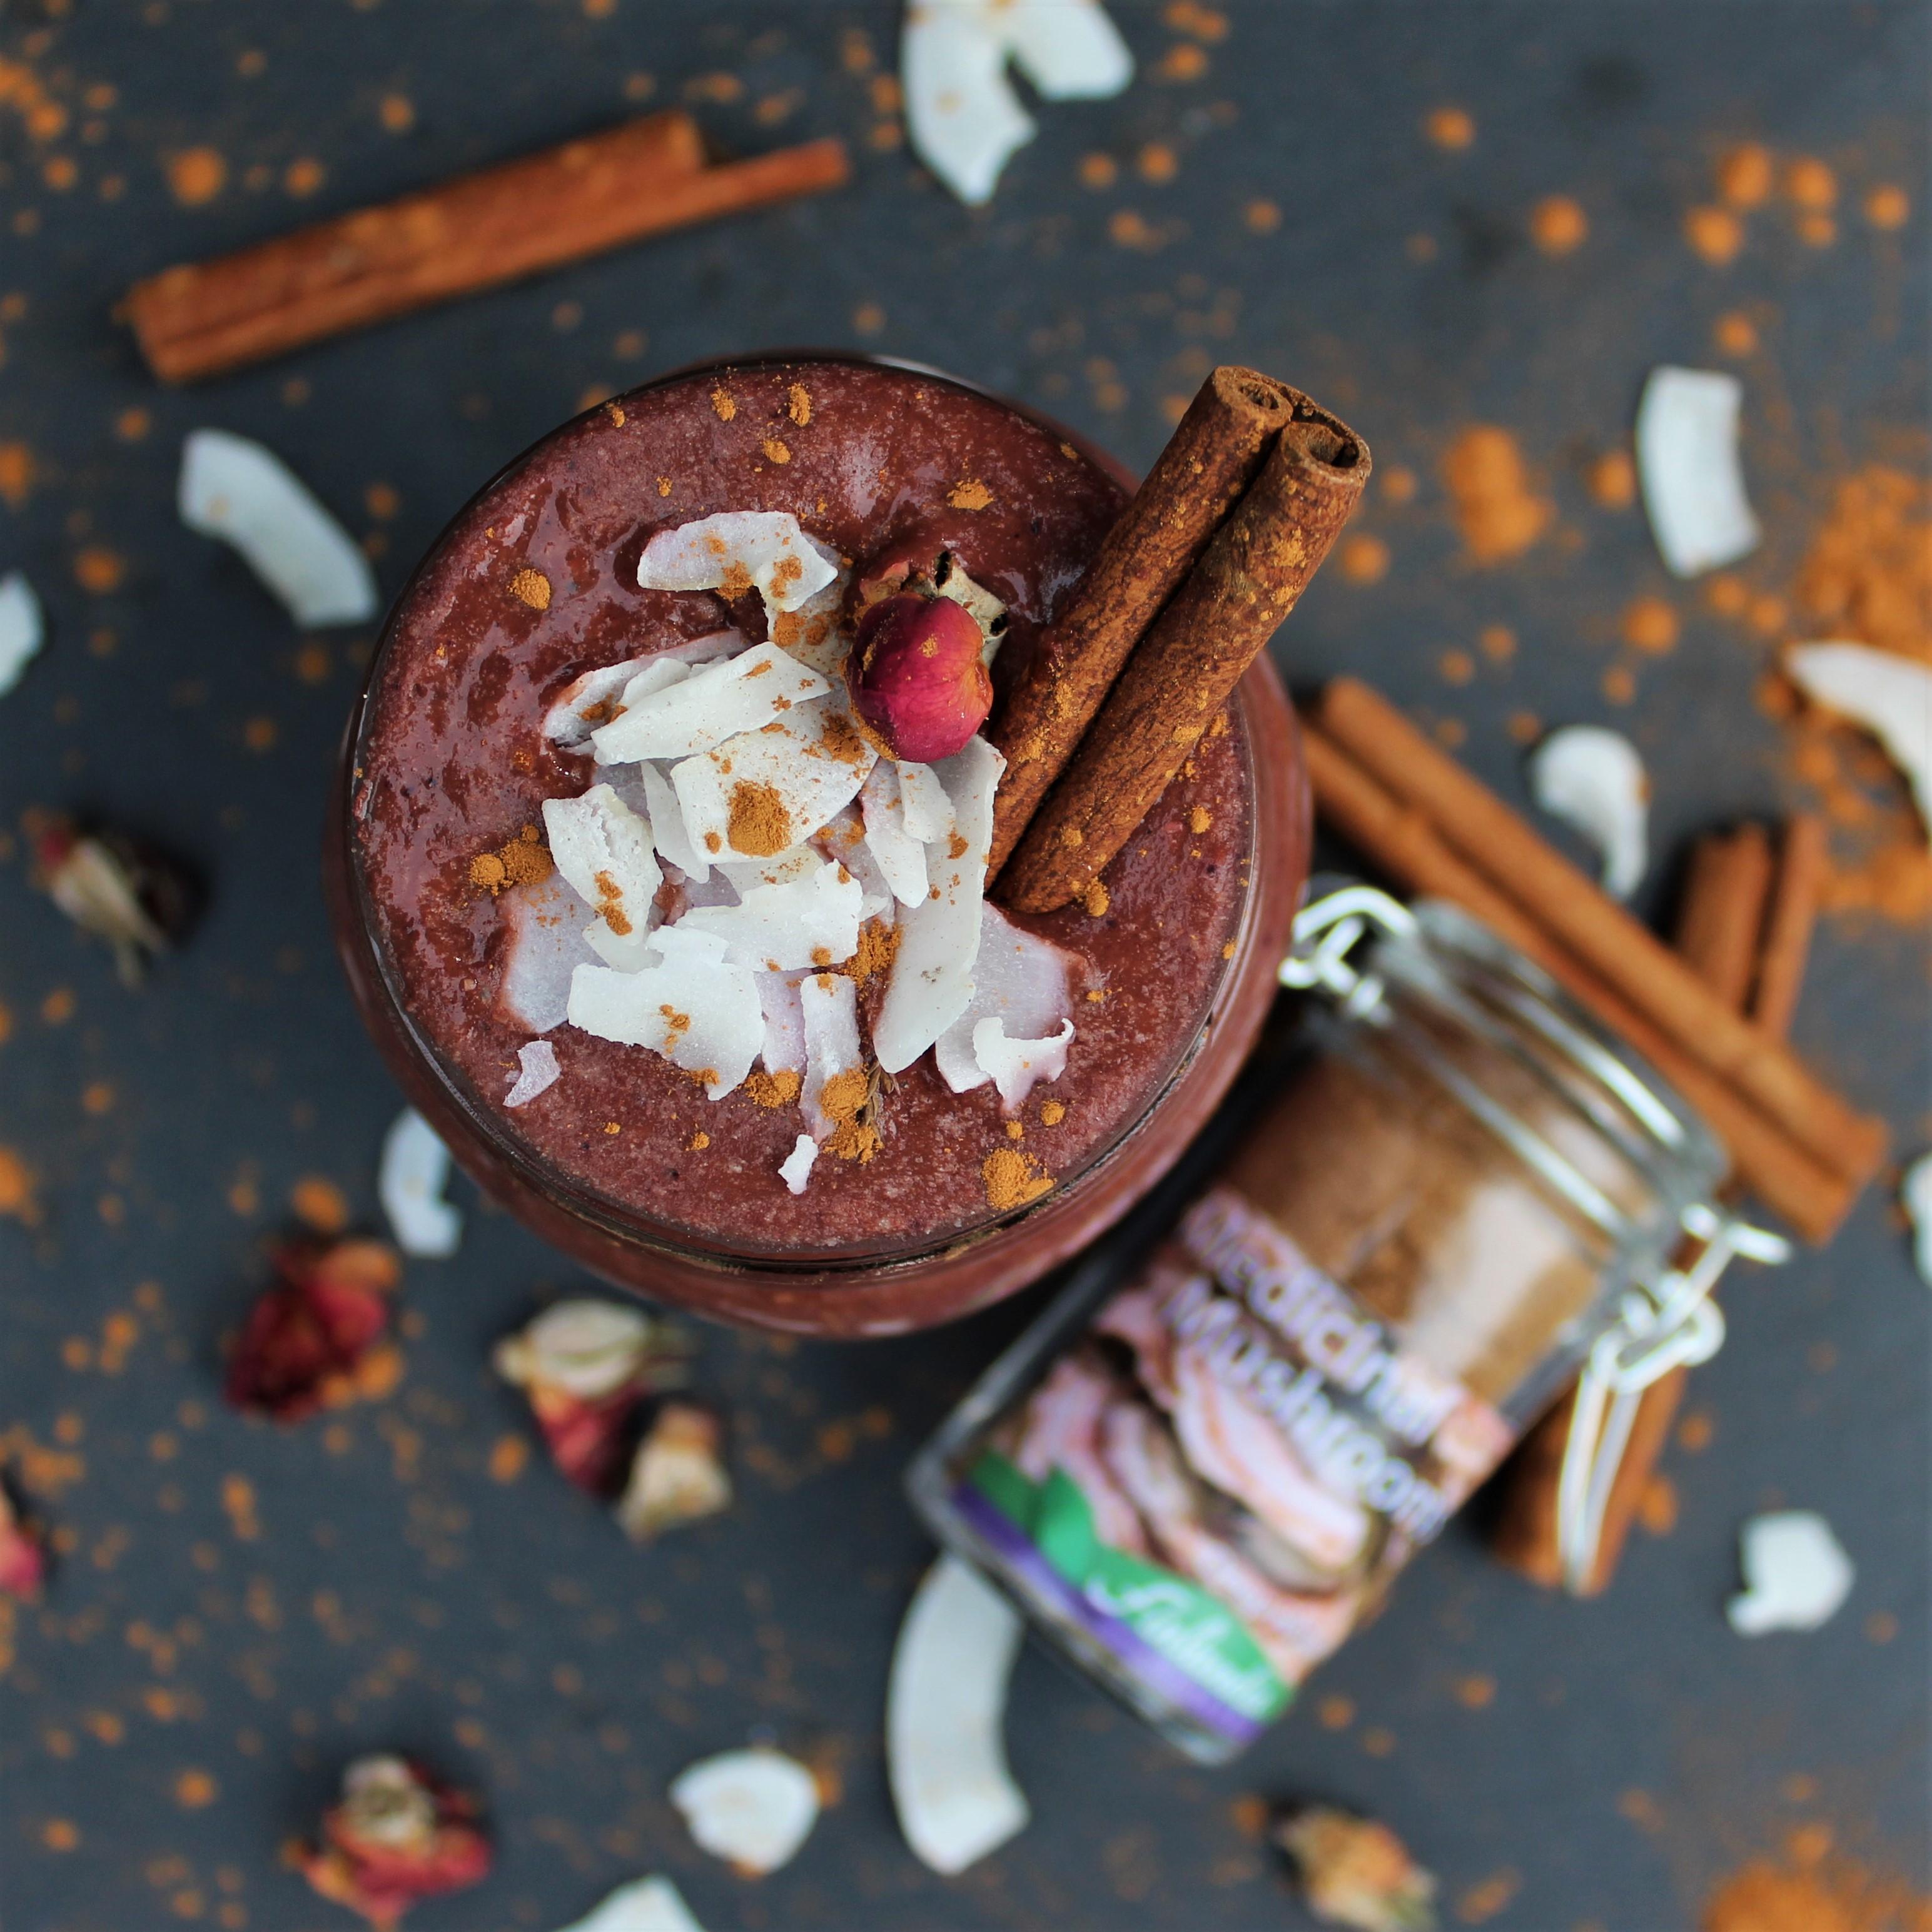 Adaptogenic Antioxidant Smoothie with Medicinal Mushrooms